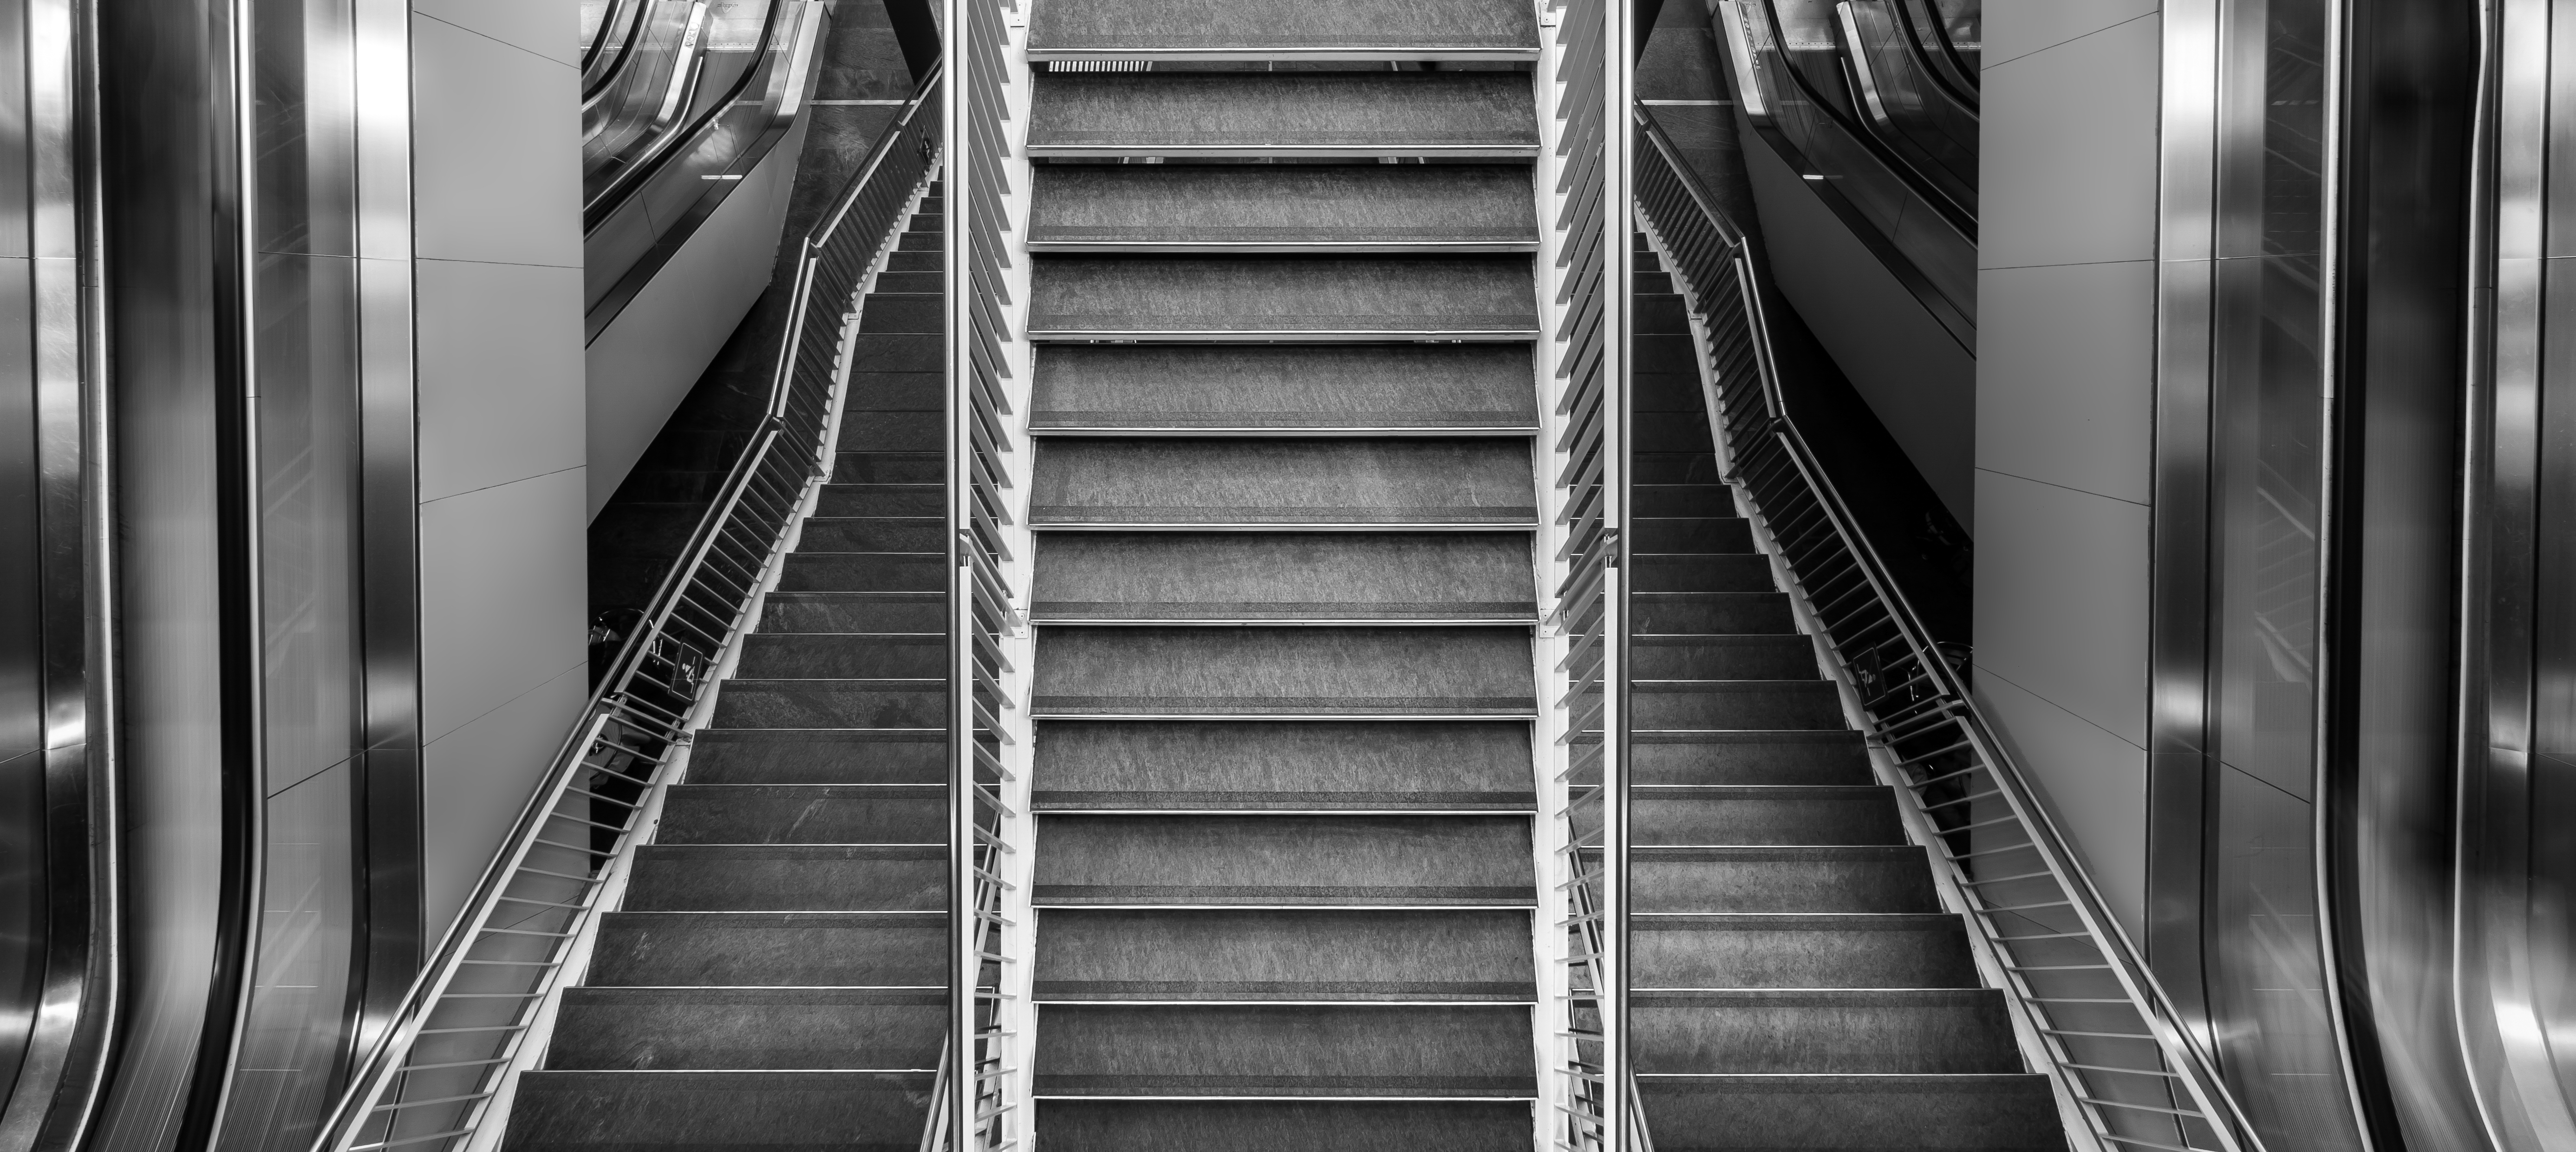 Bern Hauptbahnhof - Bern